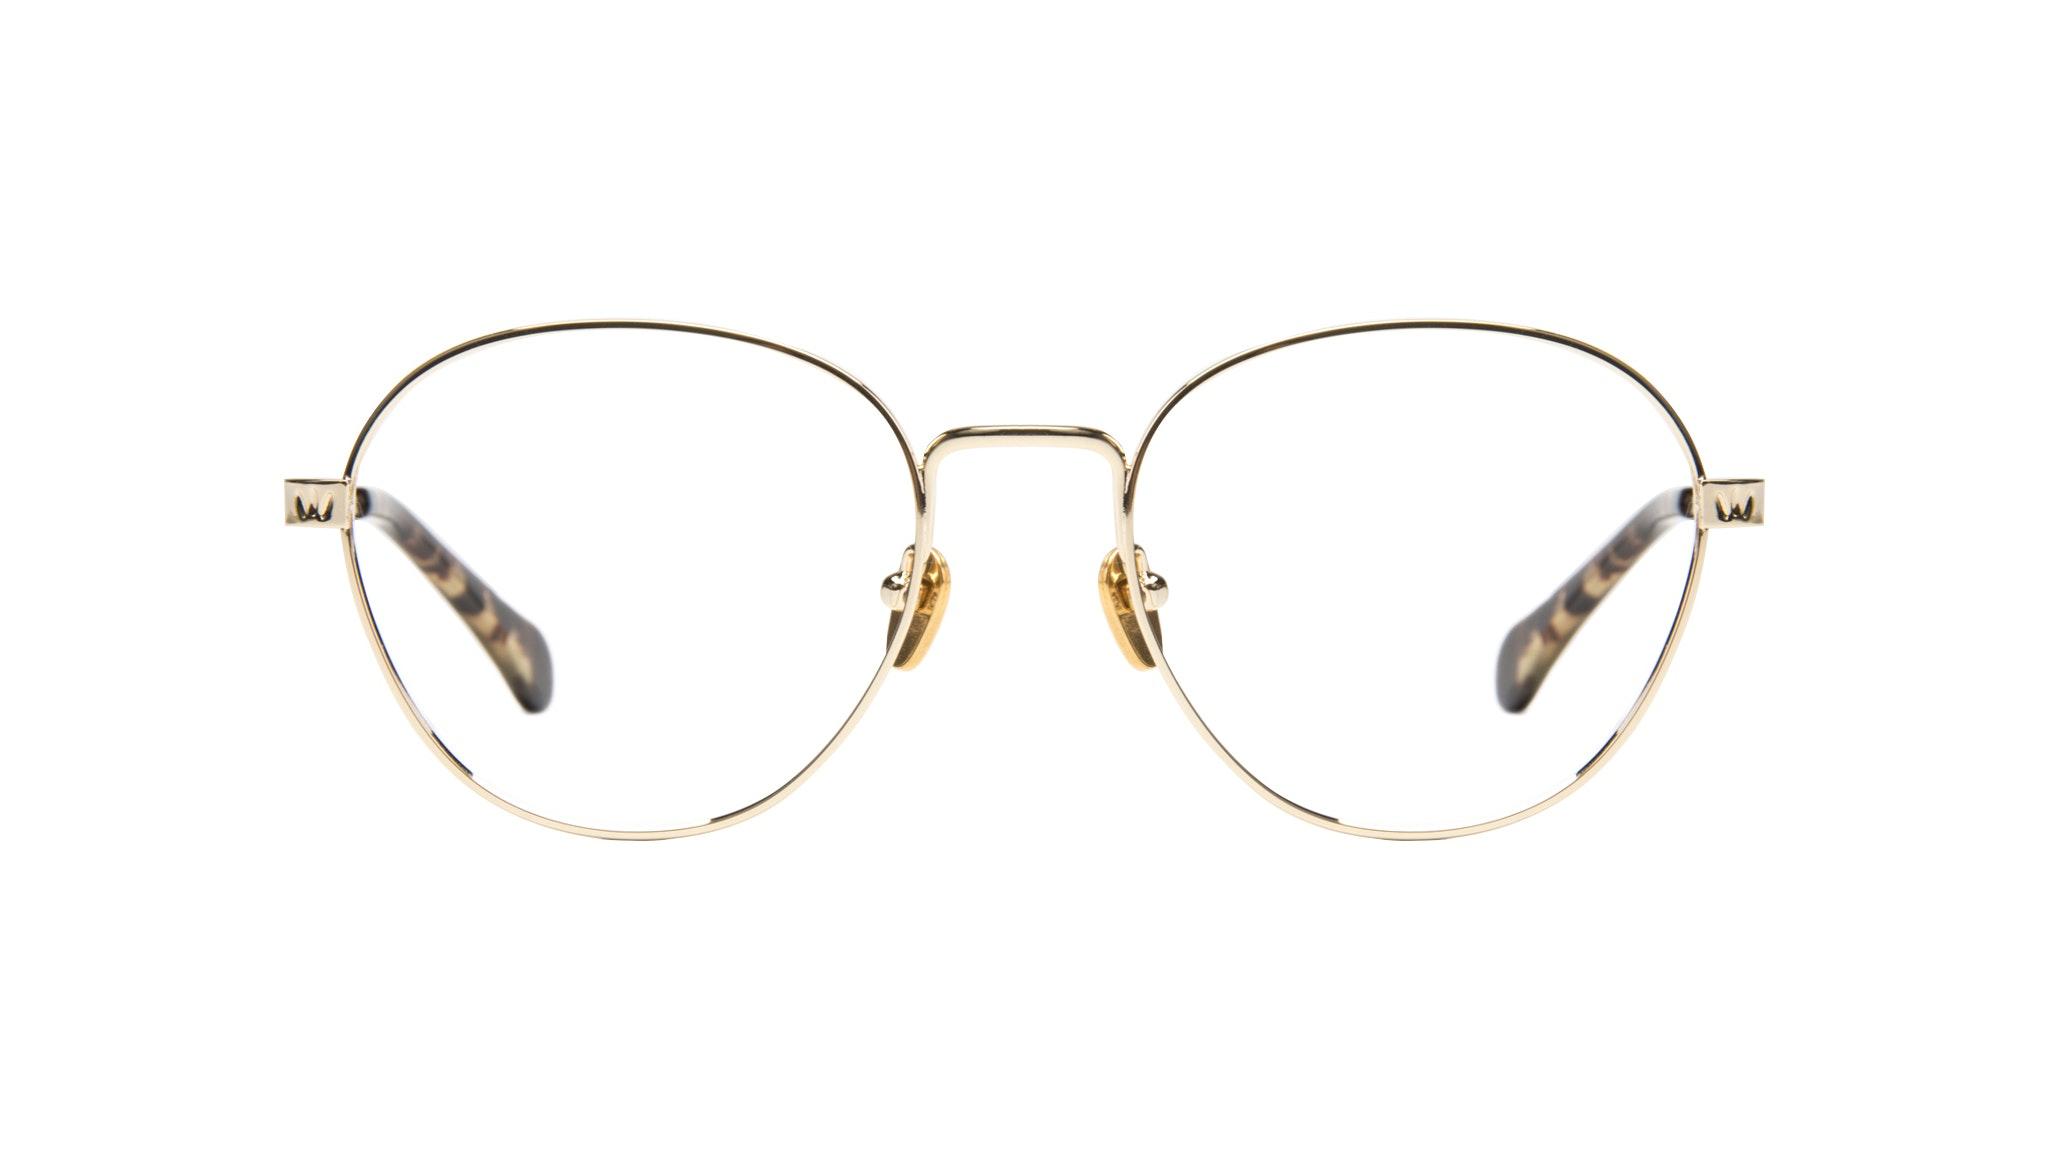 Affordable Fashion Glasses Round Eyeglasses Women Brace Gold